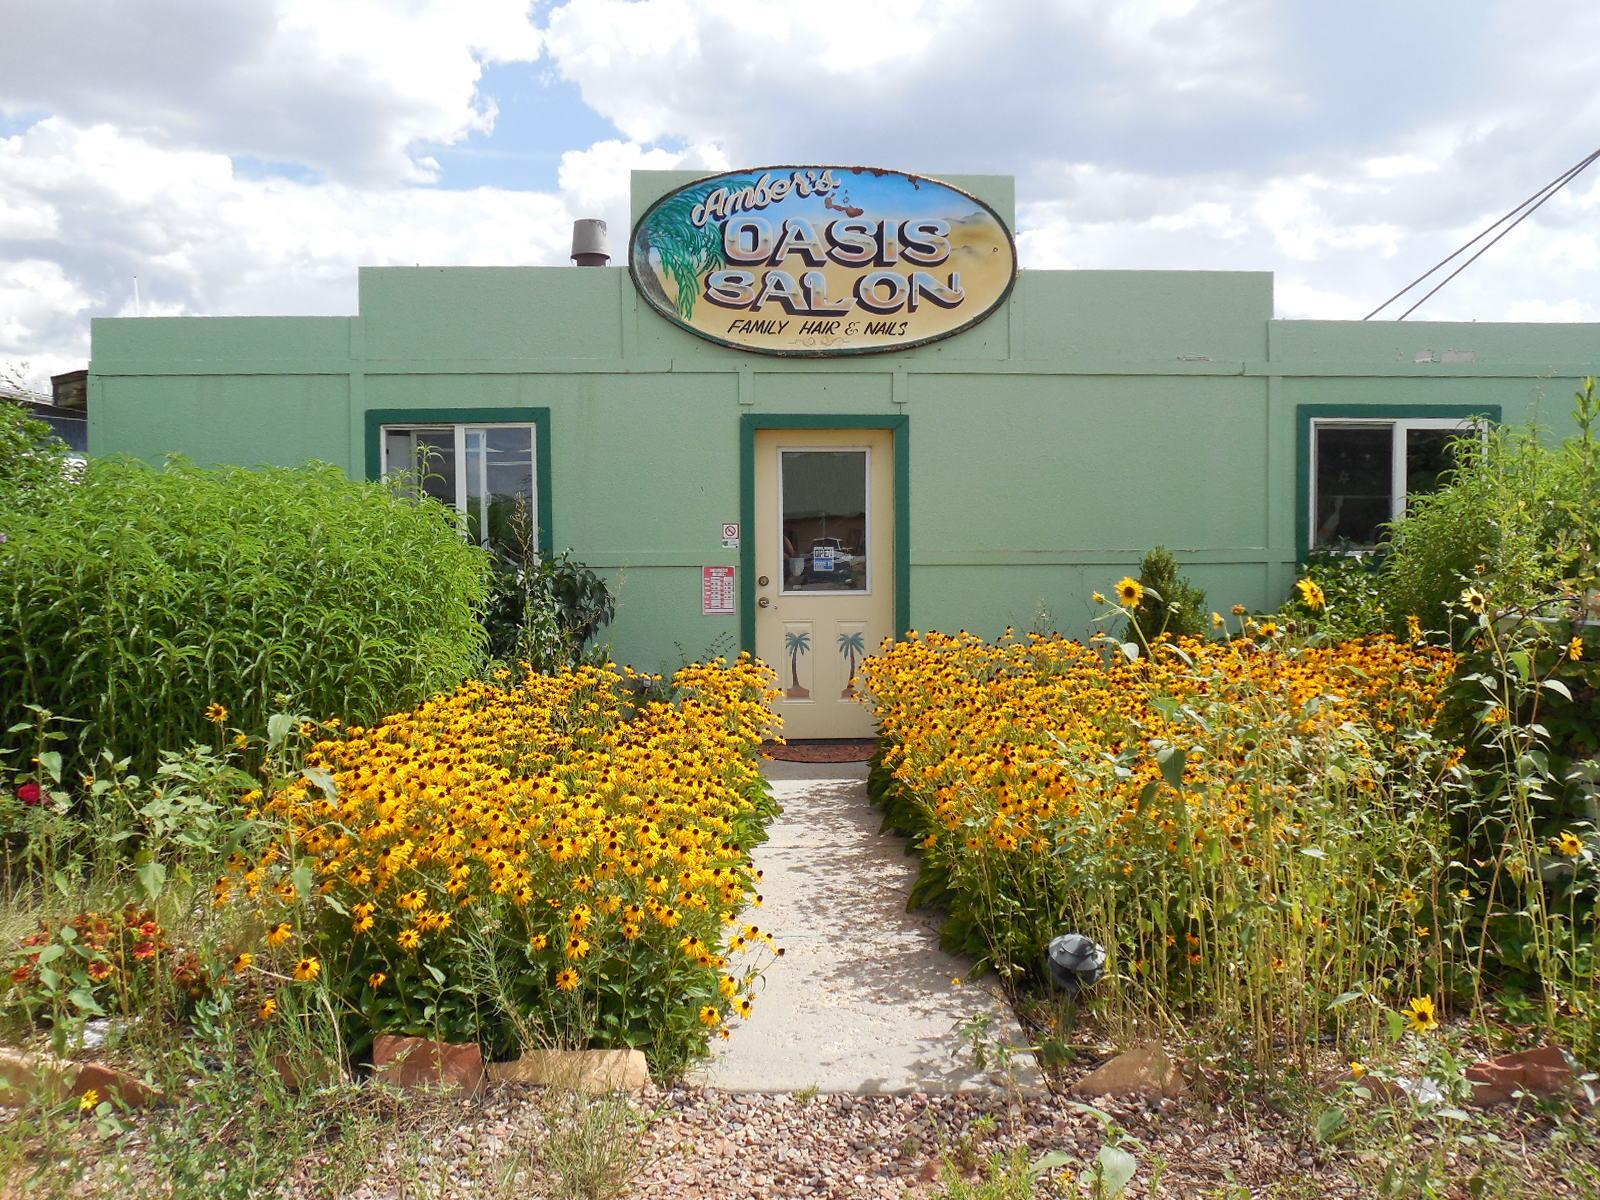 Ambers Oasis Salon